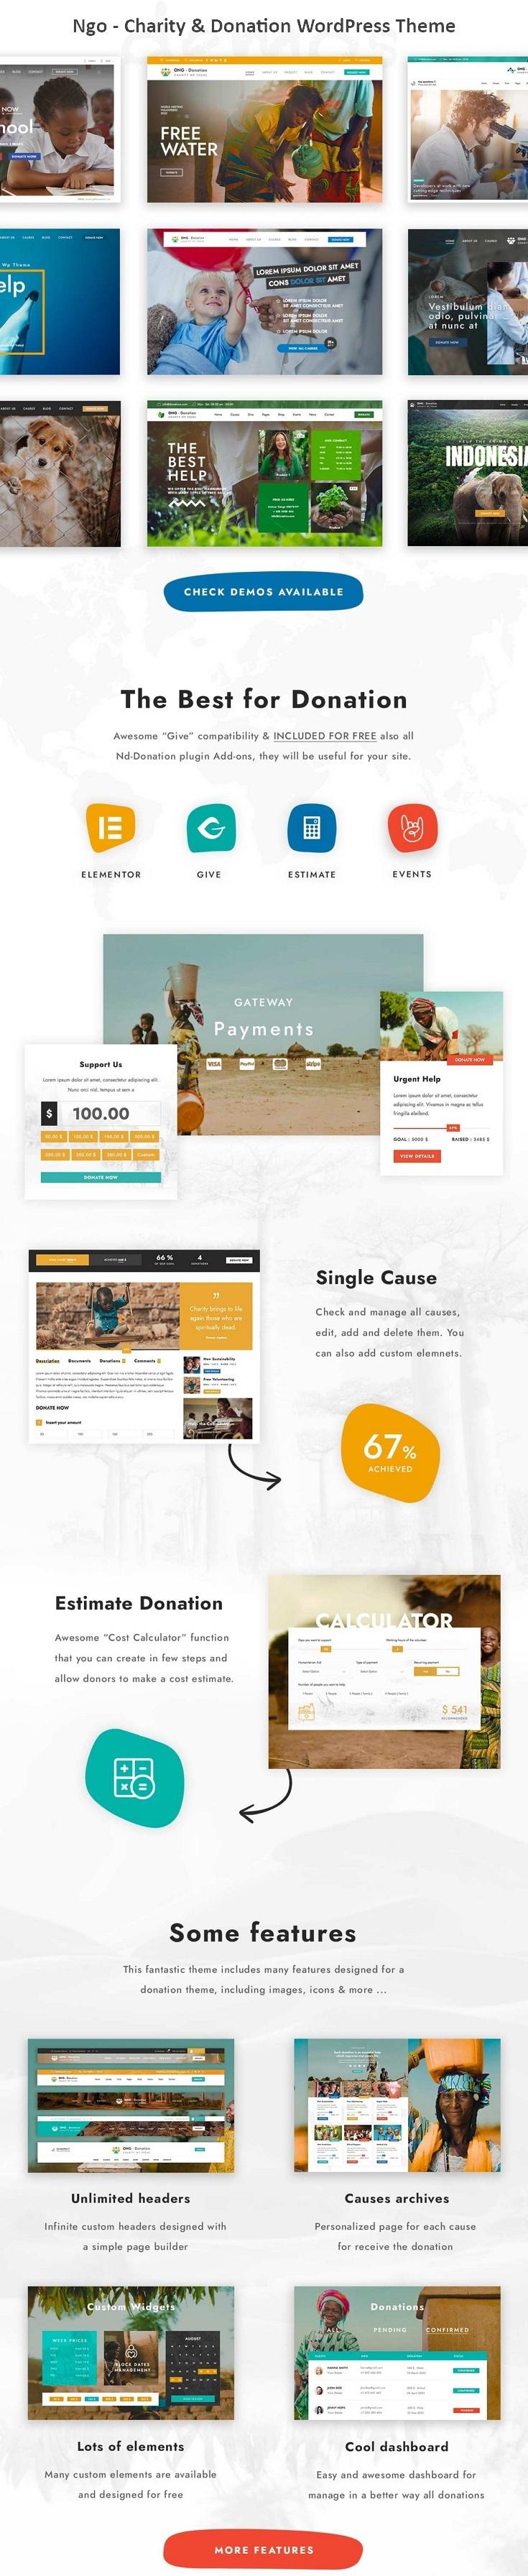 Charity & Donation Premium WordPress Themes